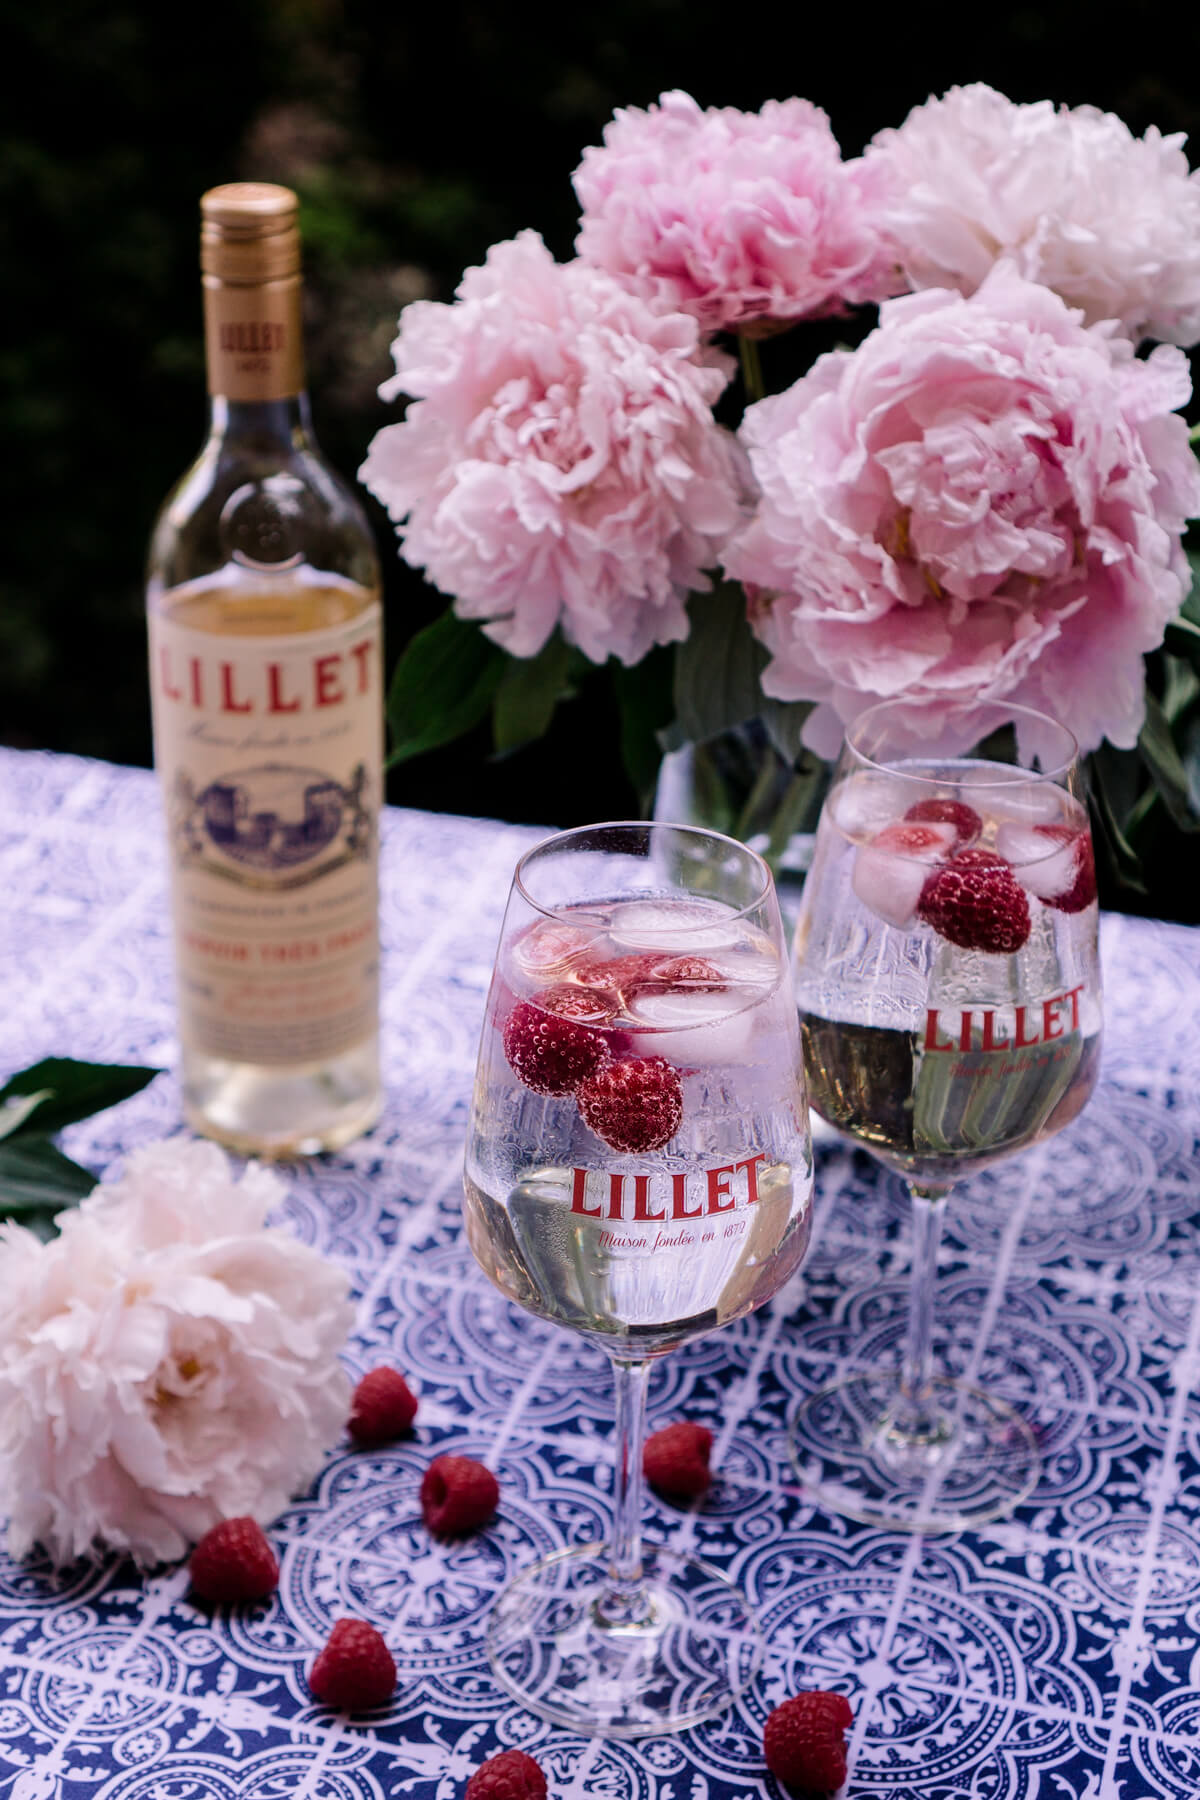 Lillet Cocktail Recipe